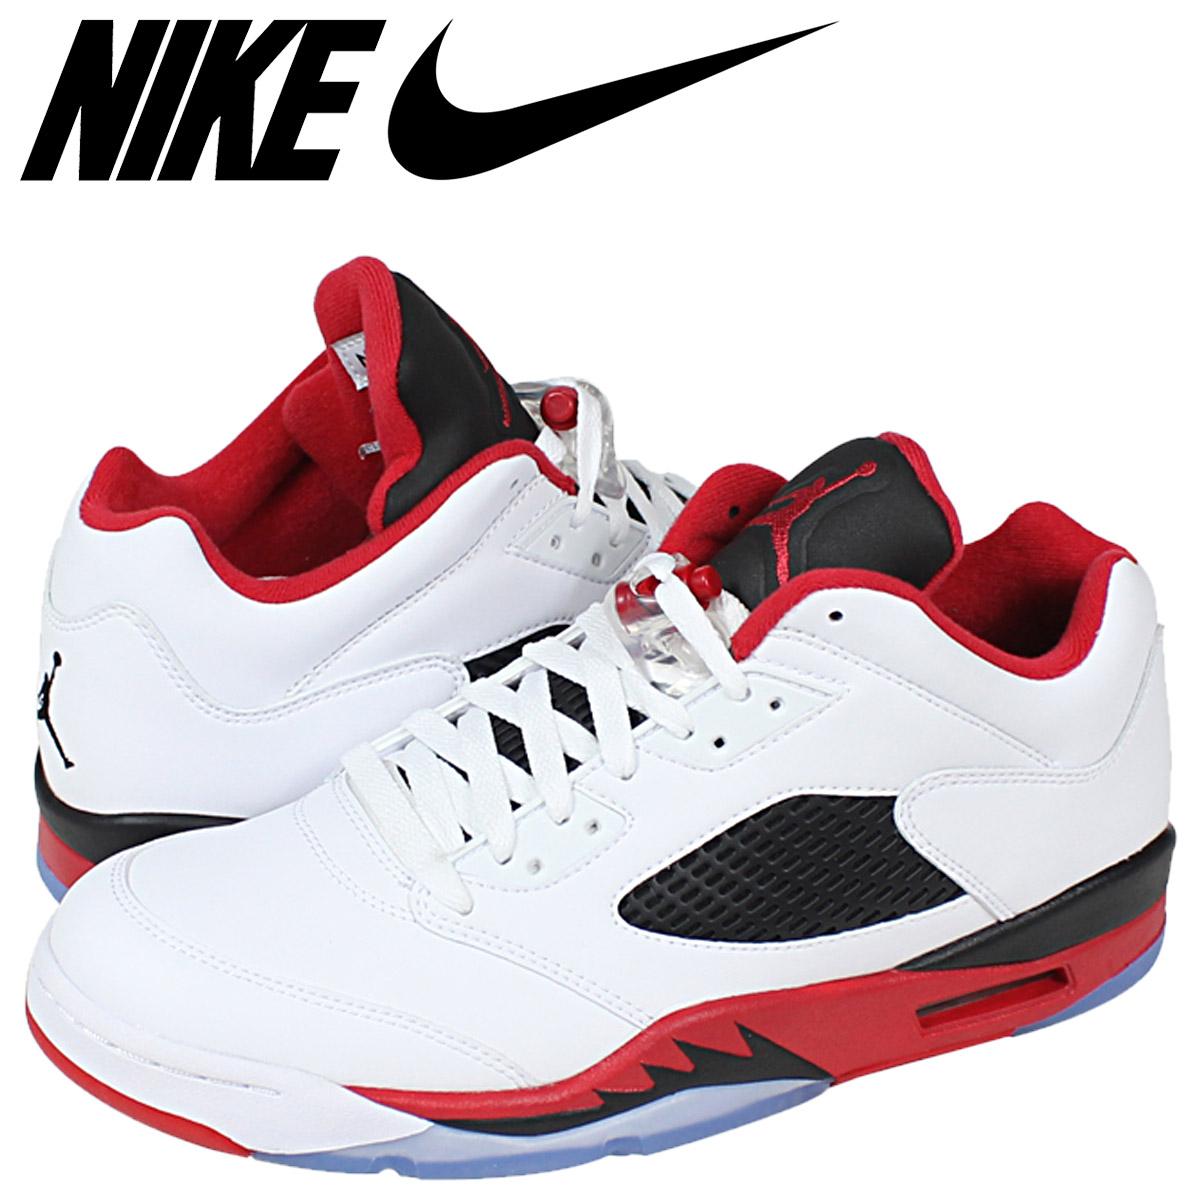 af1c0c63ab1 耐吉NIKE空氣喬丹運動鞋AIR JORDAN 5 RETRO LOW ALTERNATE 90空氣喬丹5 orutaneito  819171-101白人[◇]